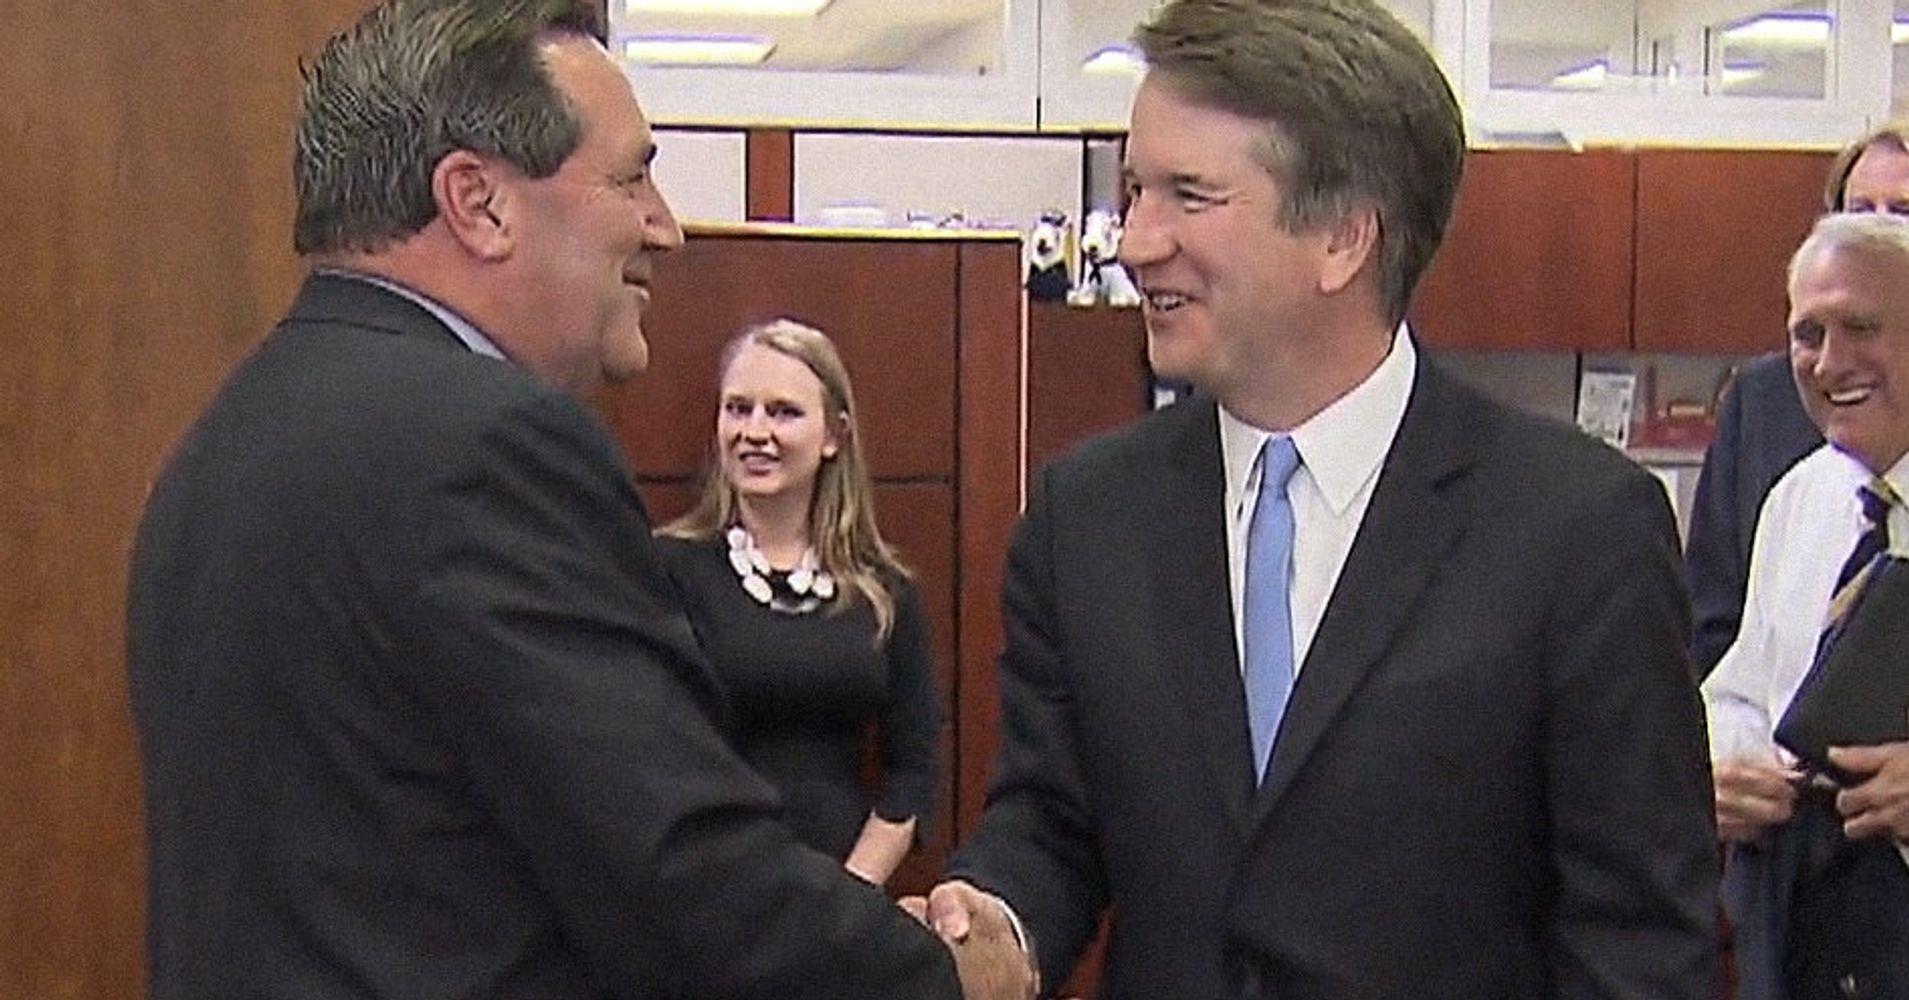 Moderate Democrats Meet With Trump Supreme Court Nominee Brett Kavanaugh | HuffPost